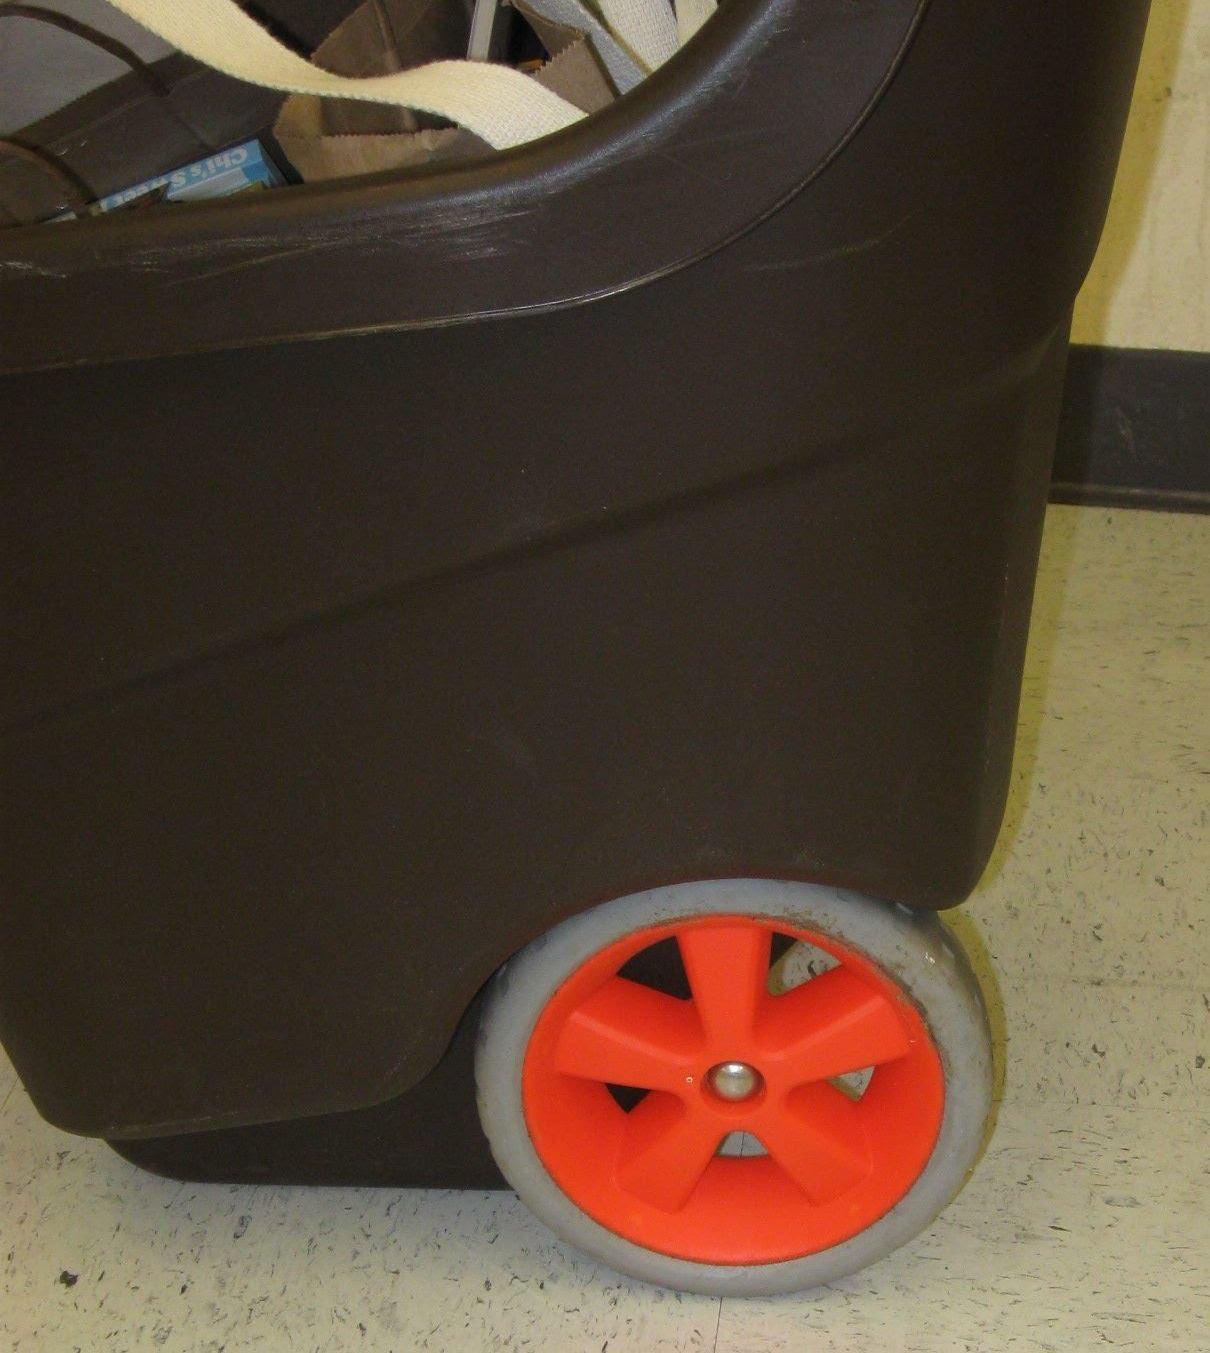 Library Outreach Hacks Plastic Tub On Wheels